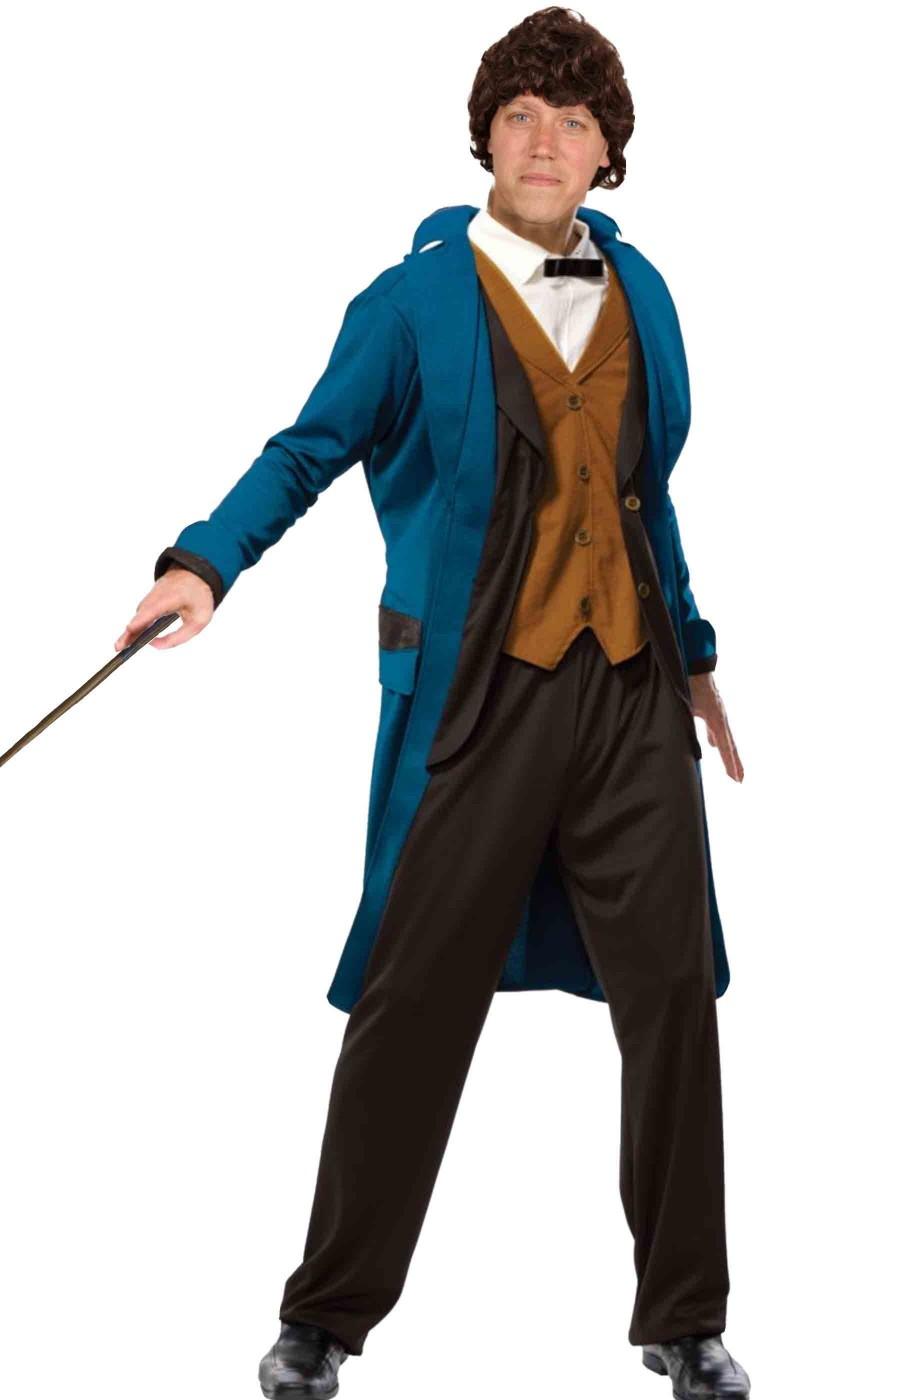 Costume di Newt Scamander